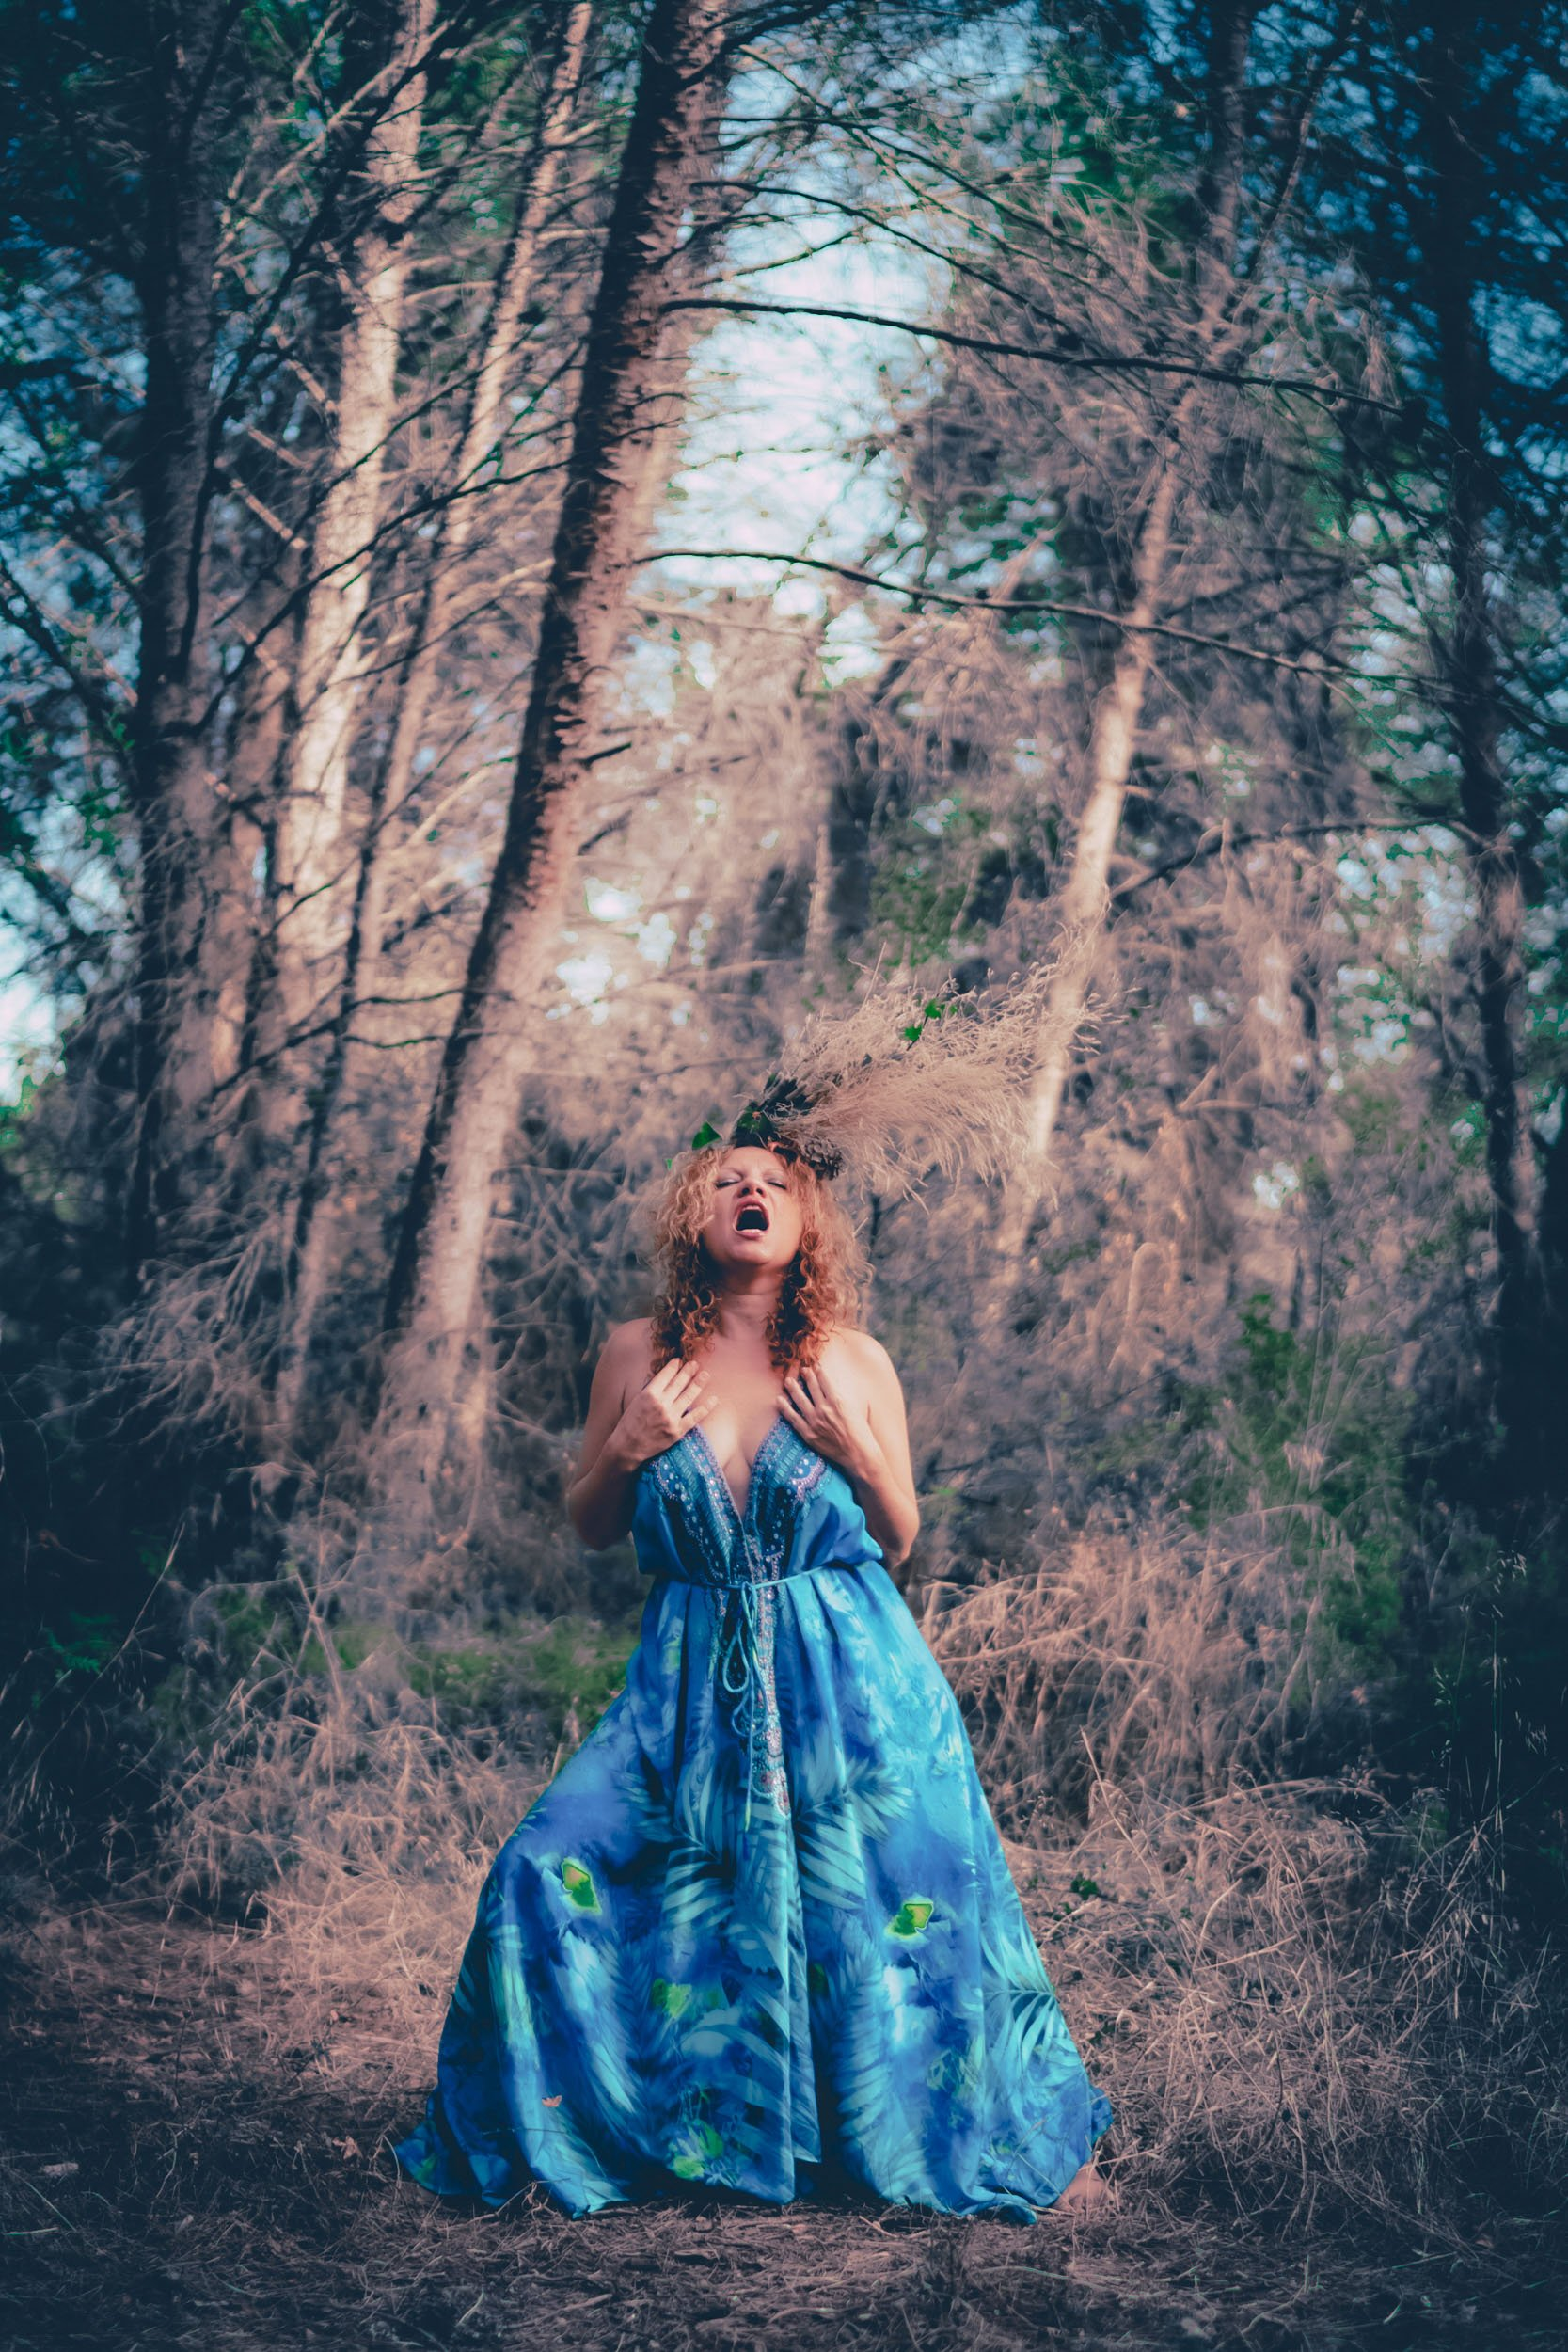 jodie-louise-goddess-photoshoots-30